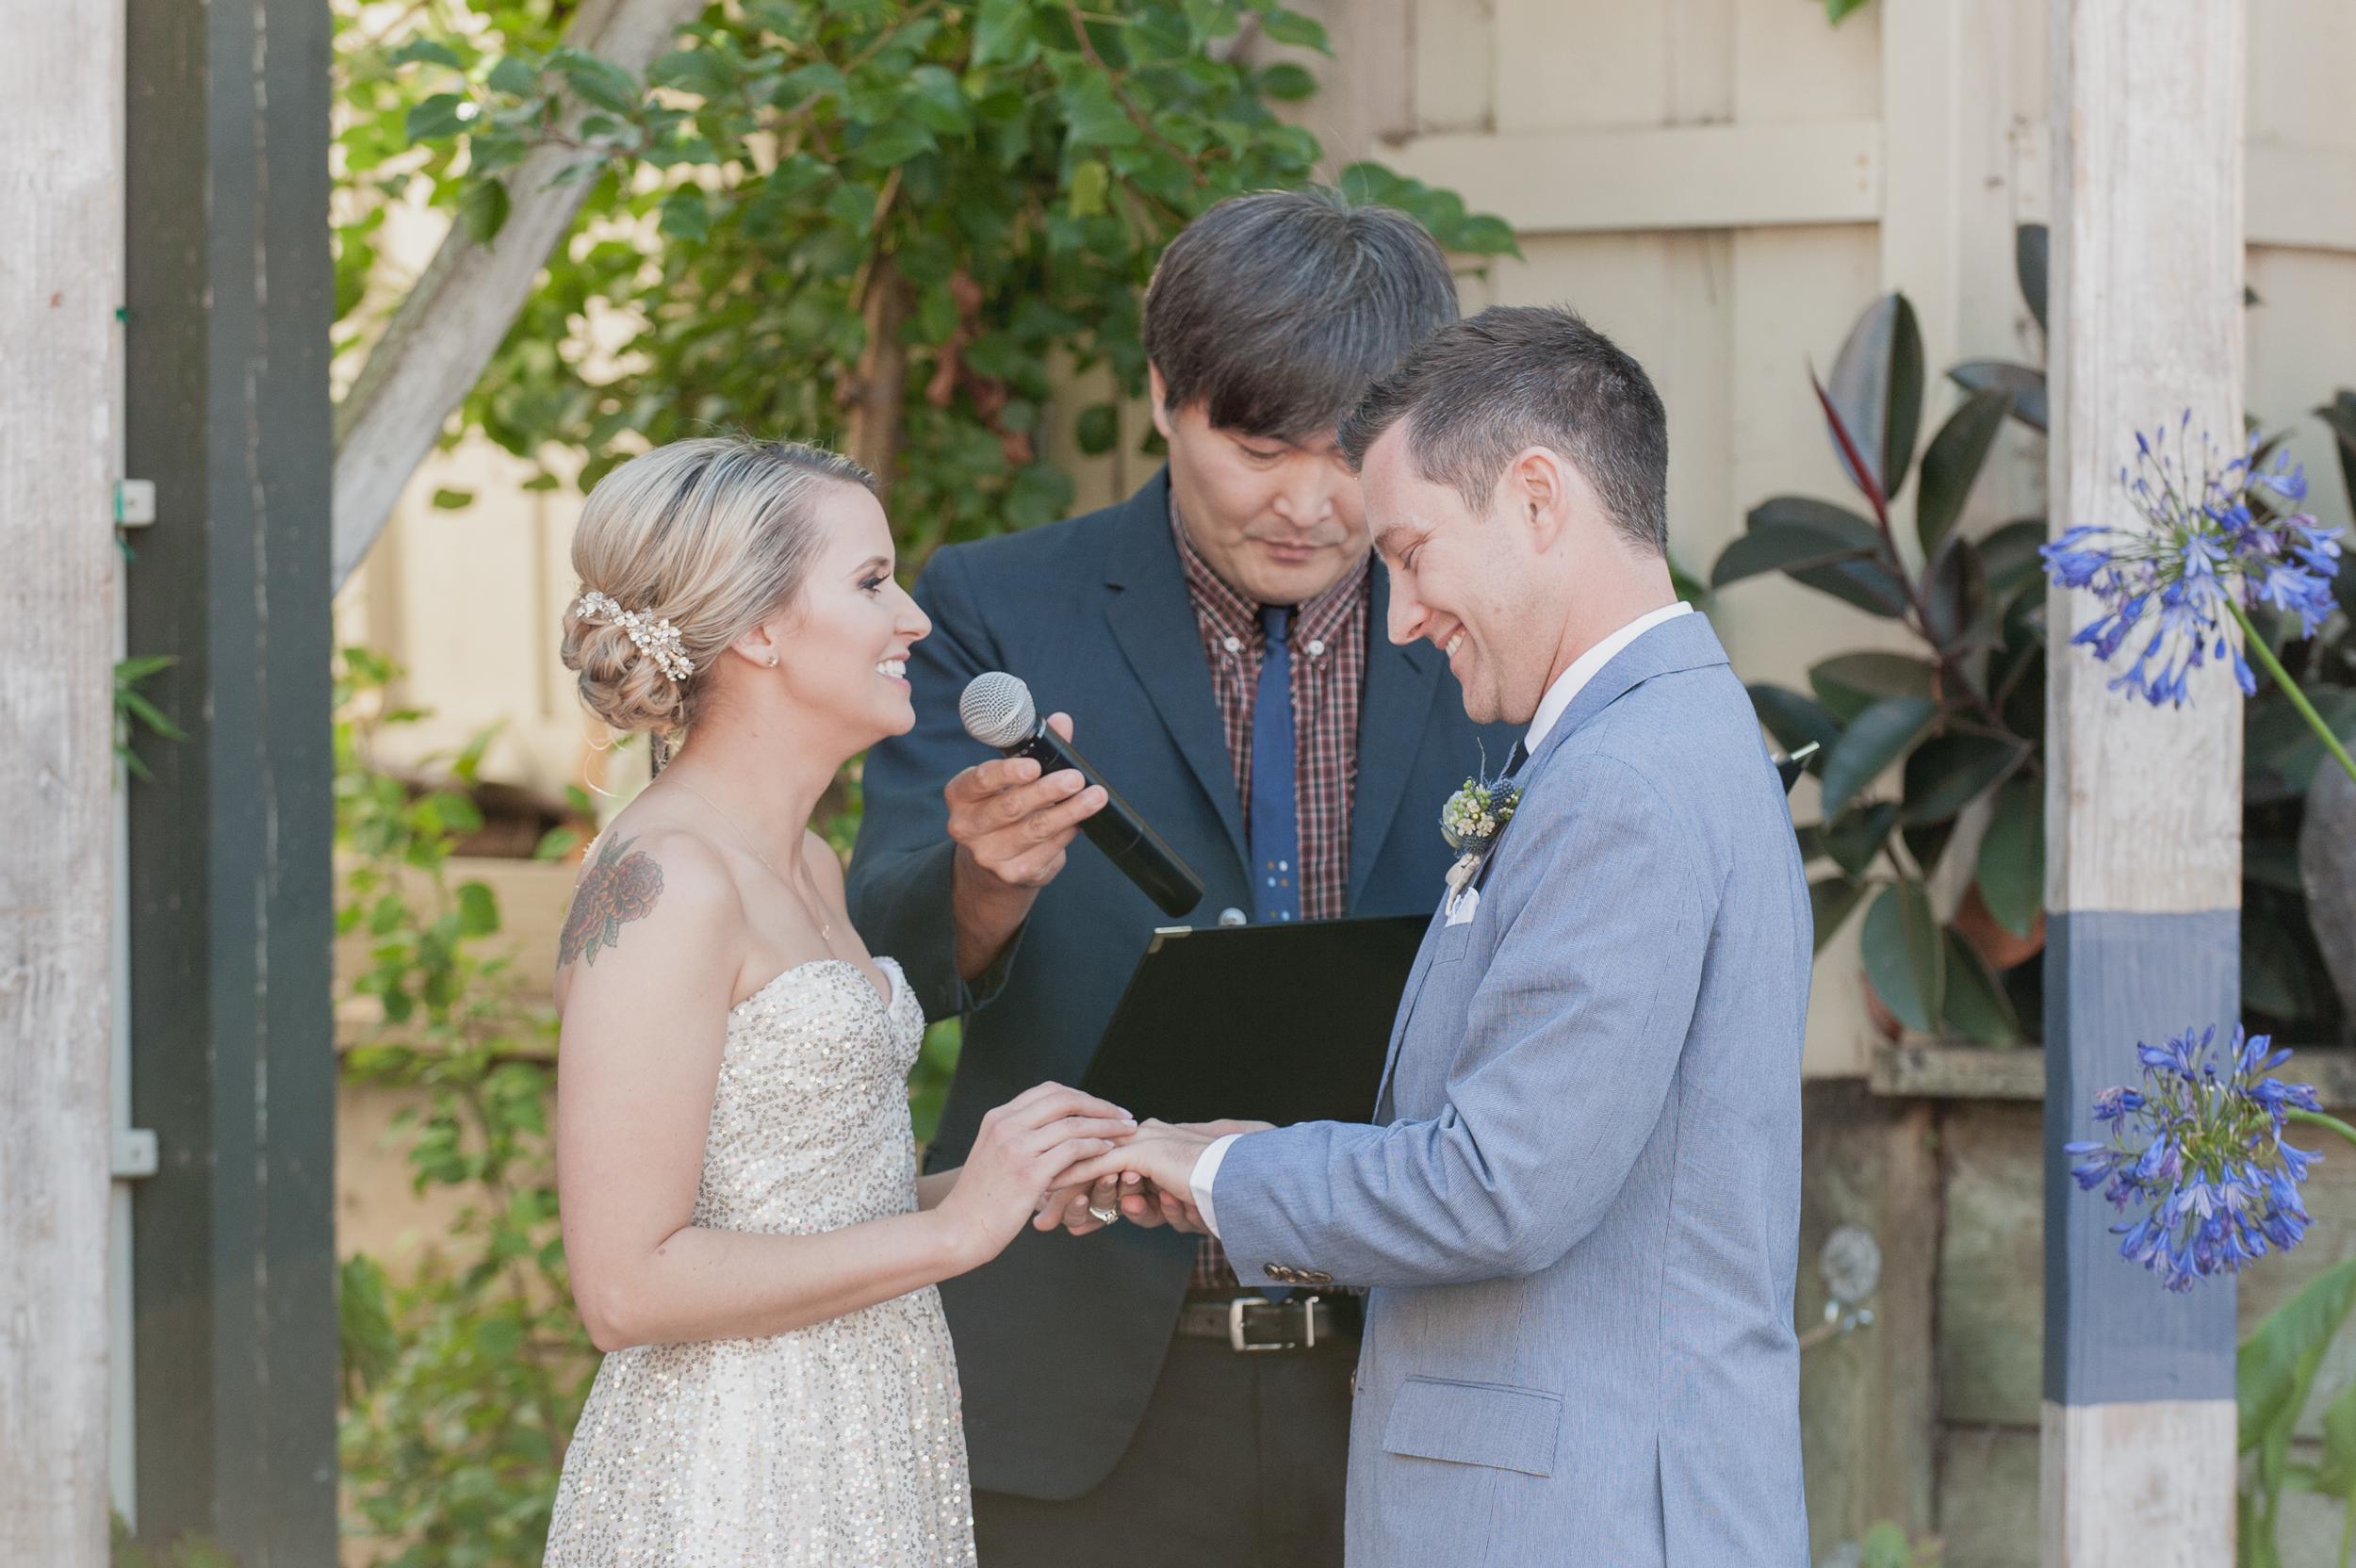 studio-333-sausalito-wedding-photographer-vc21.jpg